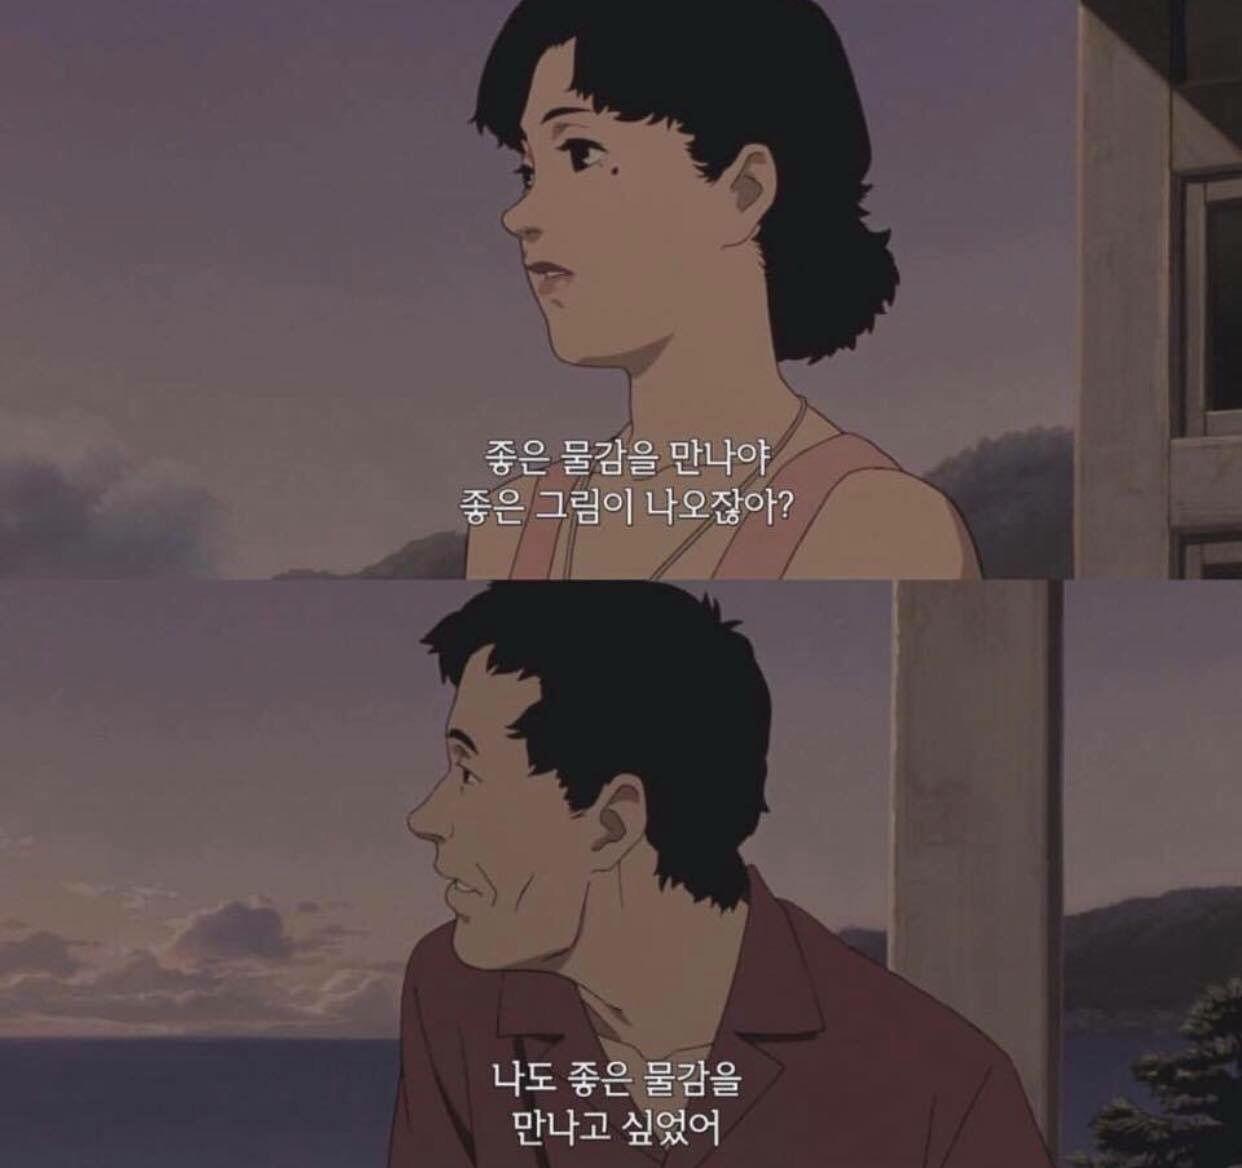 Aesthetic anime에 있는 Sleepy님의 핀 2020 영화 인용구, 말 그림, 긍정적인 말